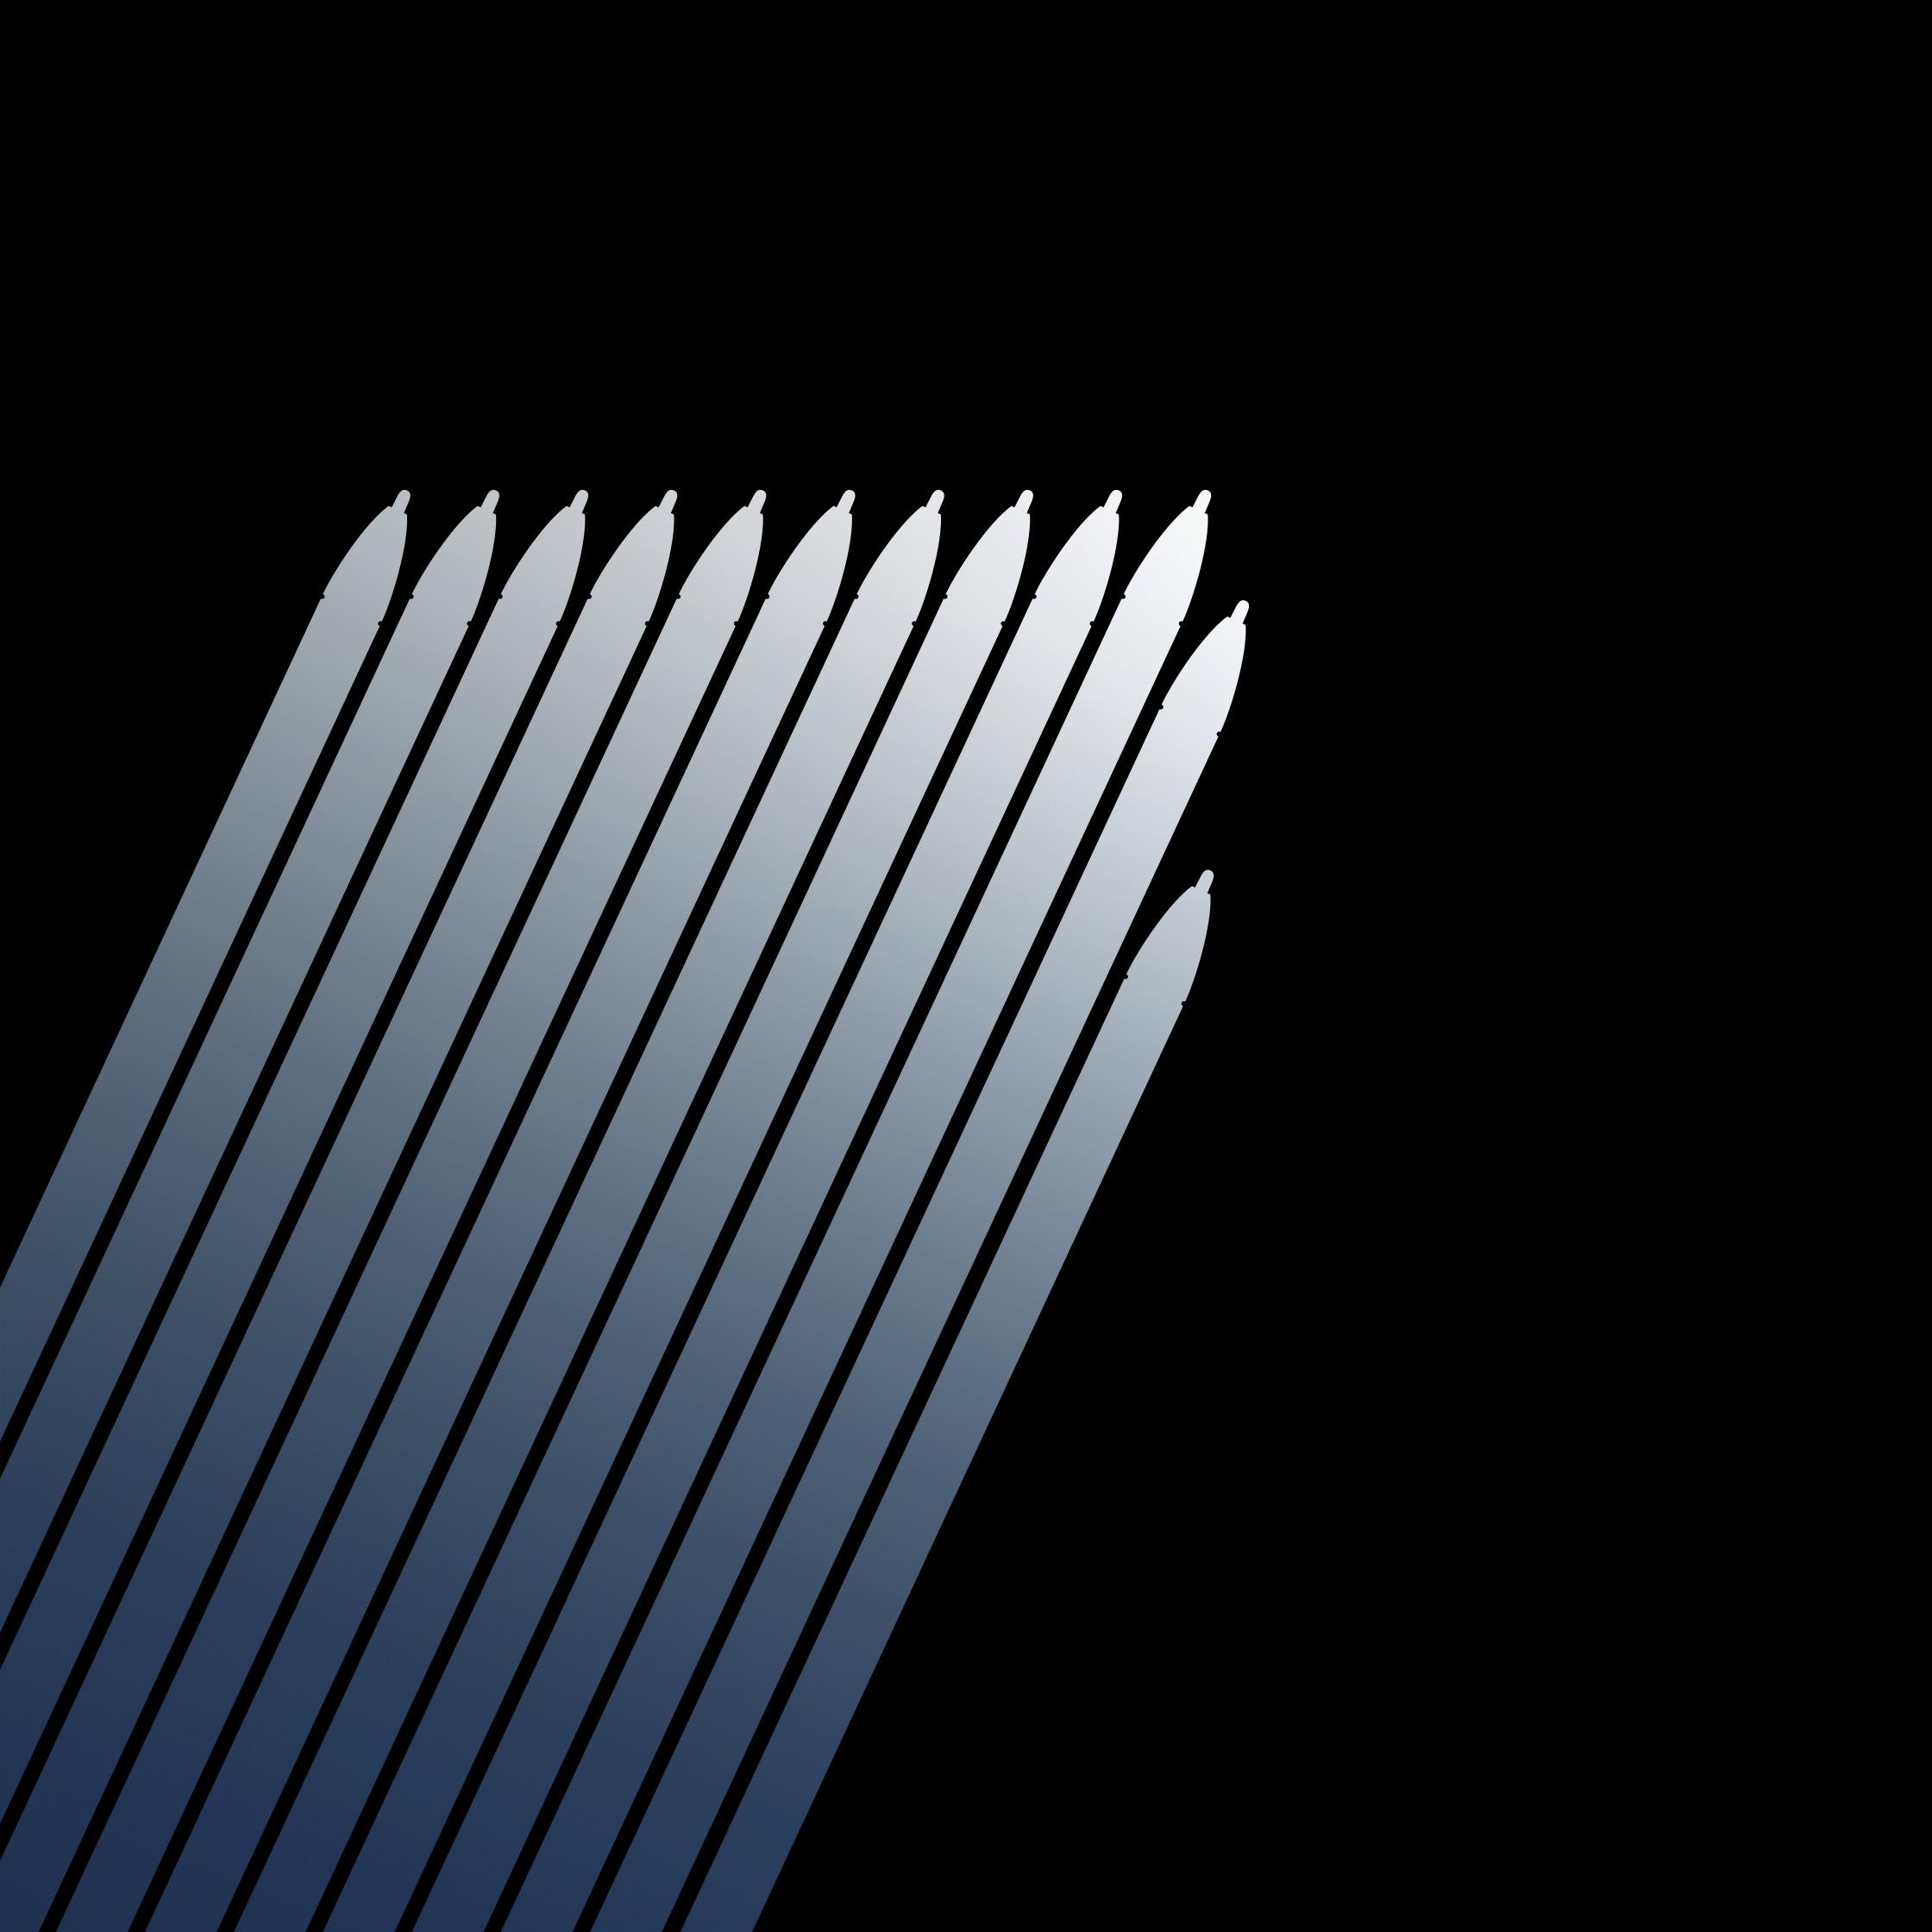 Samsung Galaxy Note 7 wallpaper